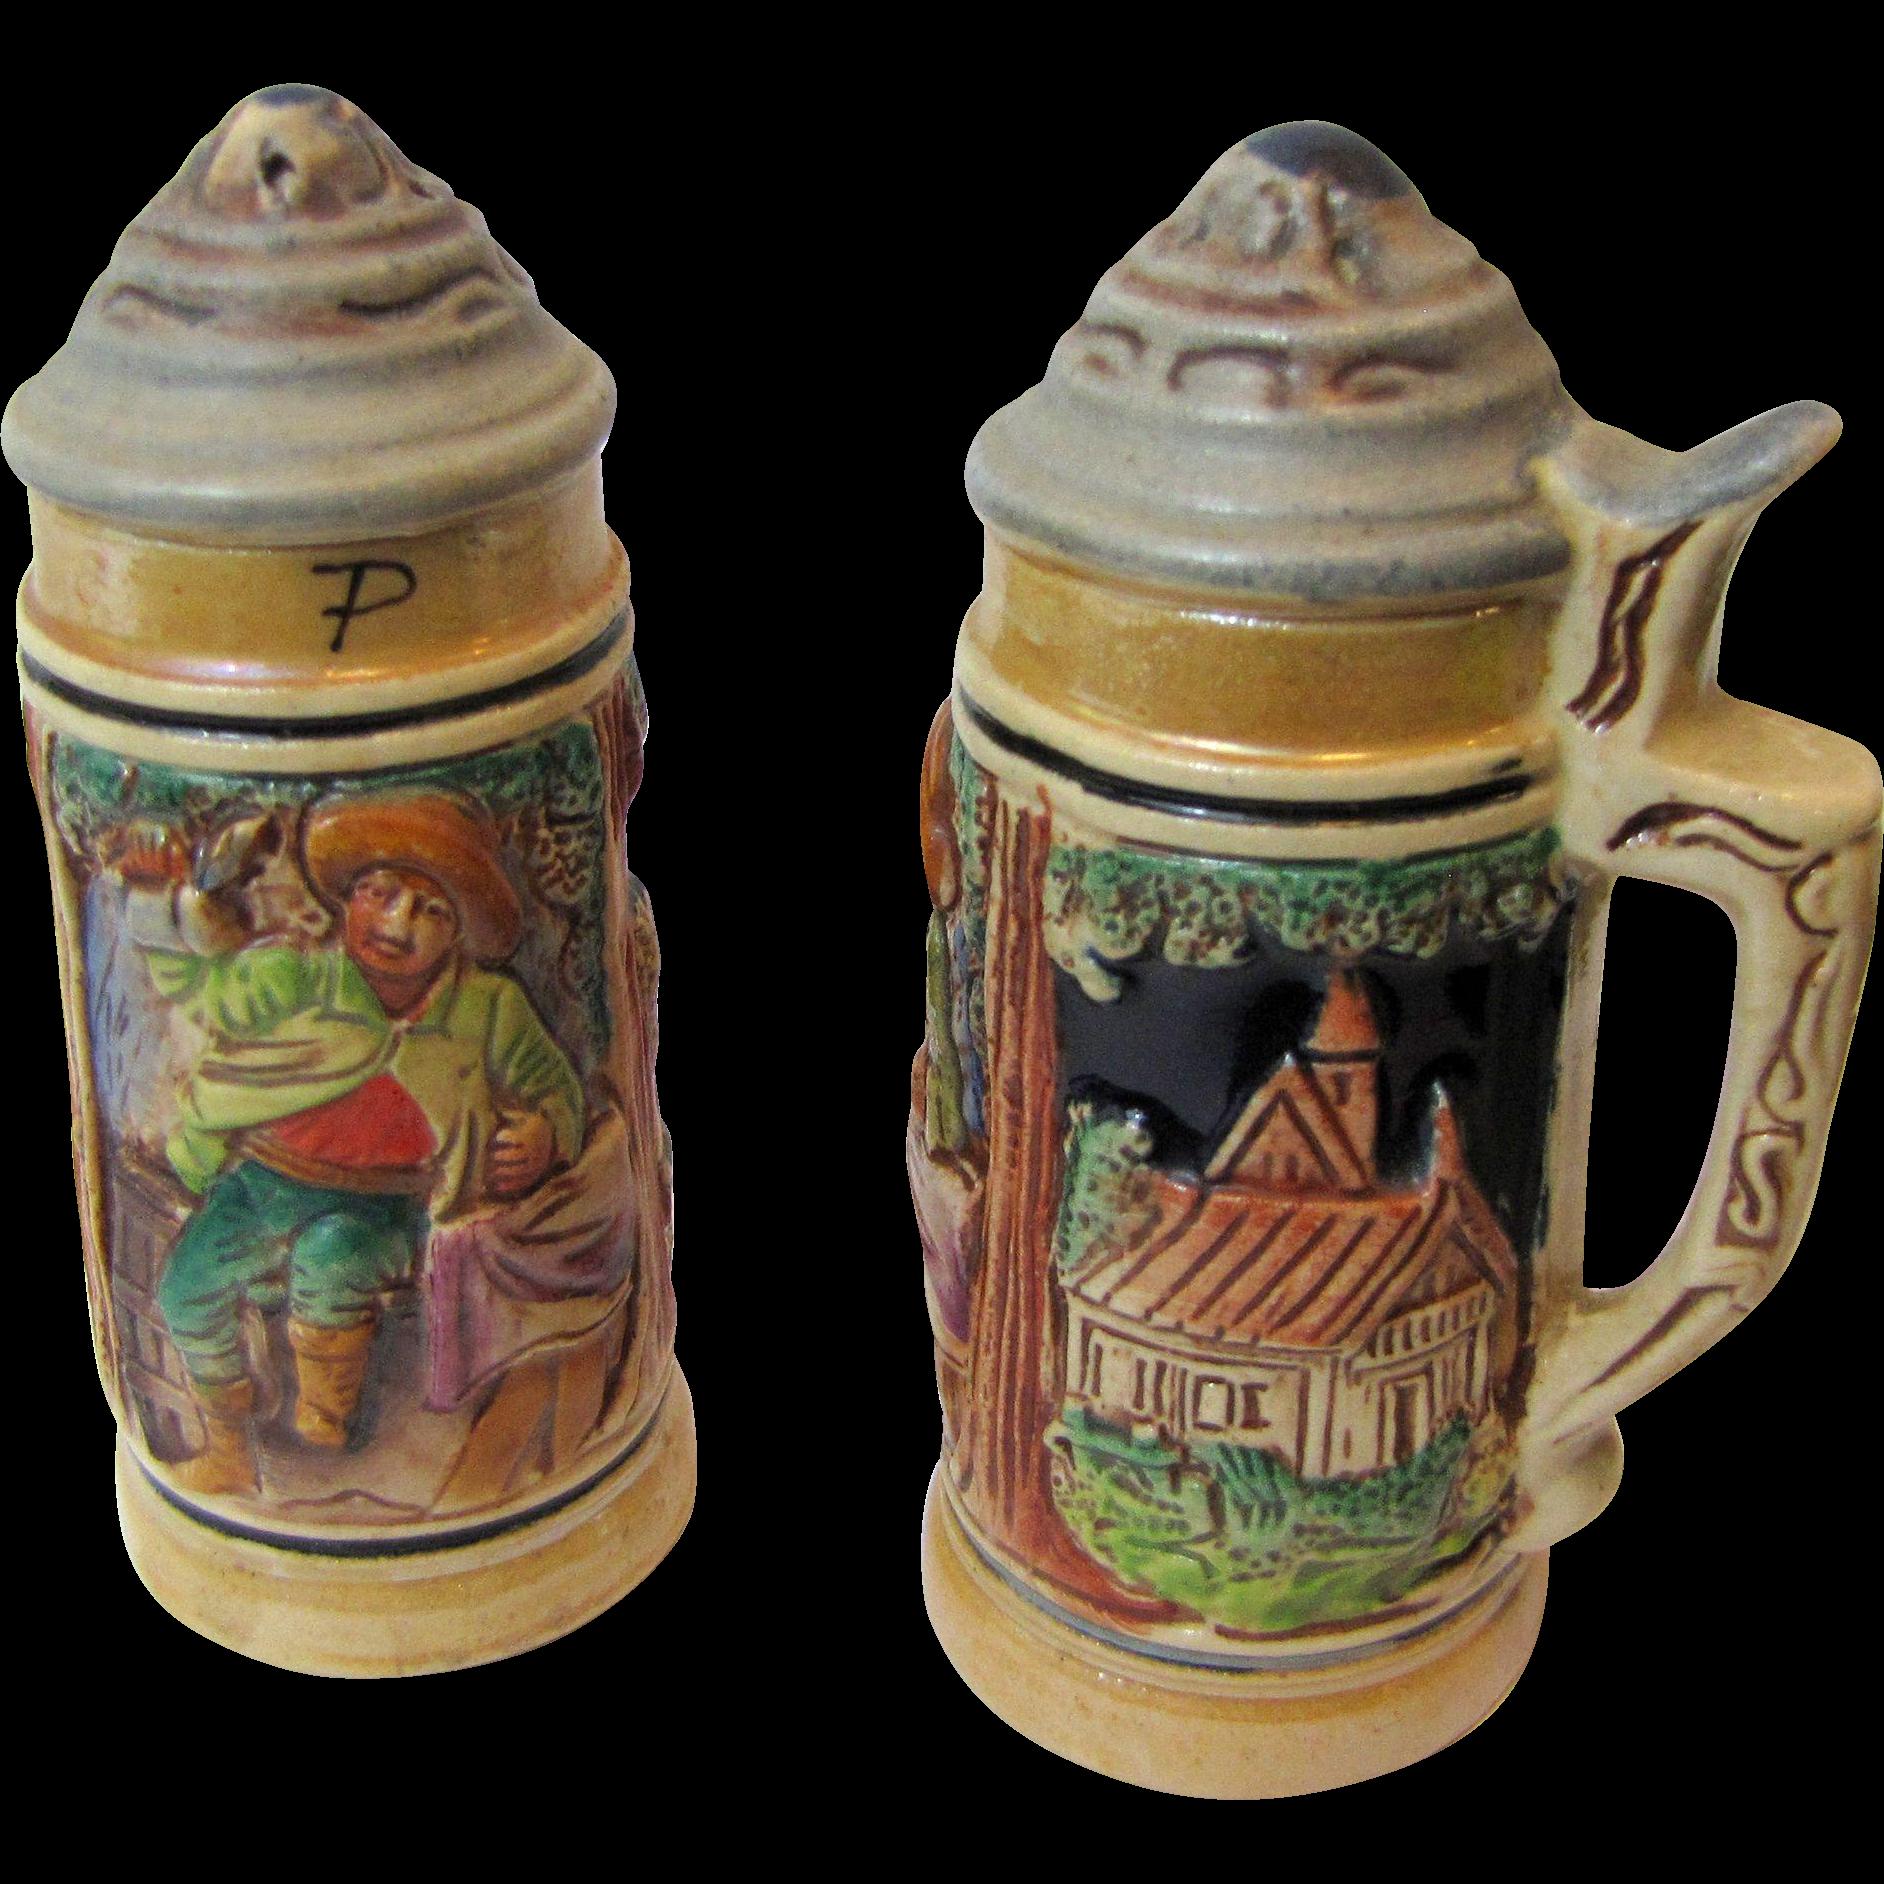 Harris Decorative Beer Stein Salt Pepper Shakers From